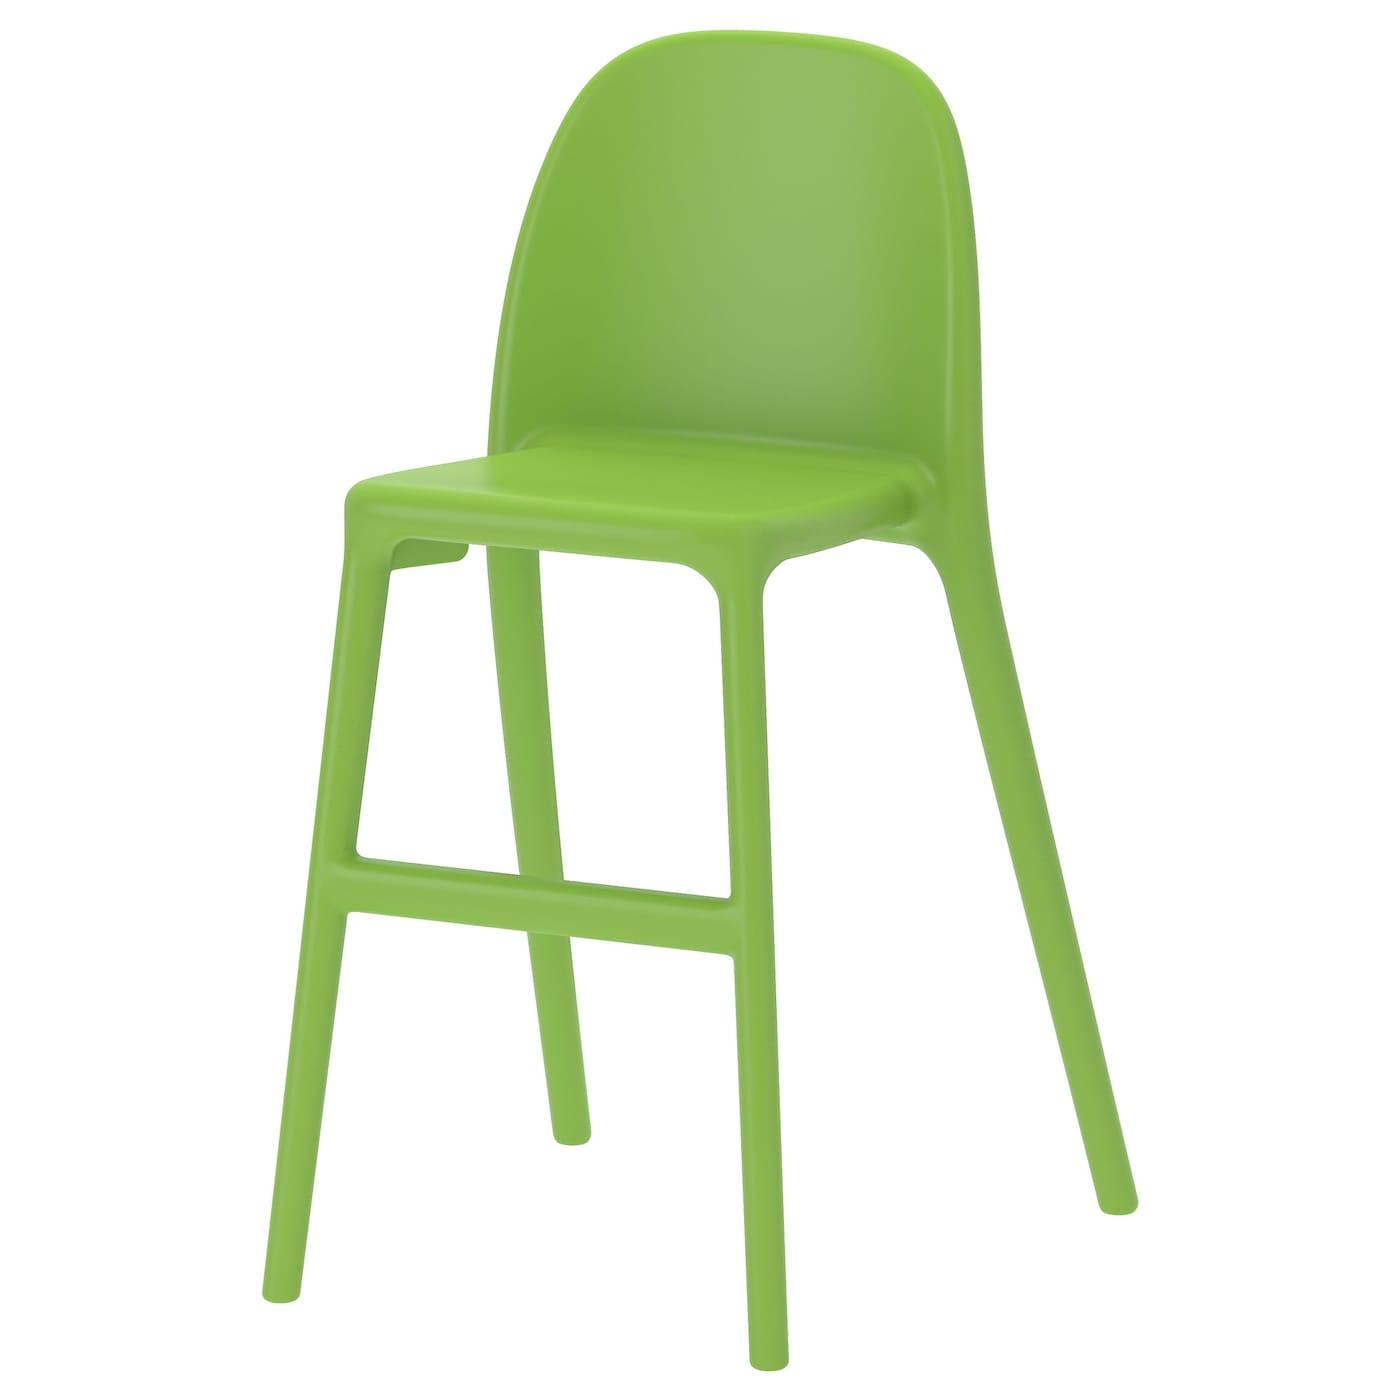 URBAN Silla júnior Verde - IKEA